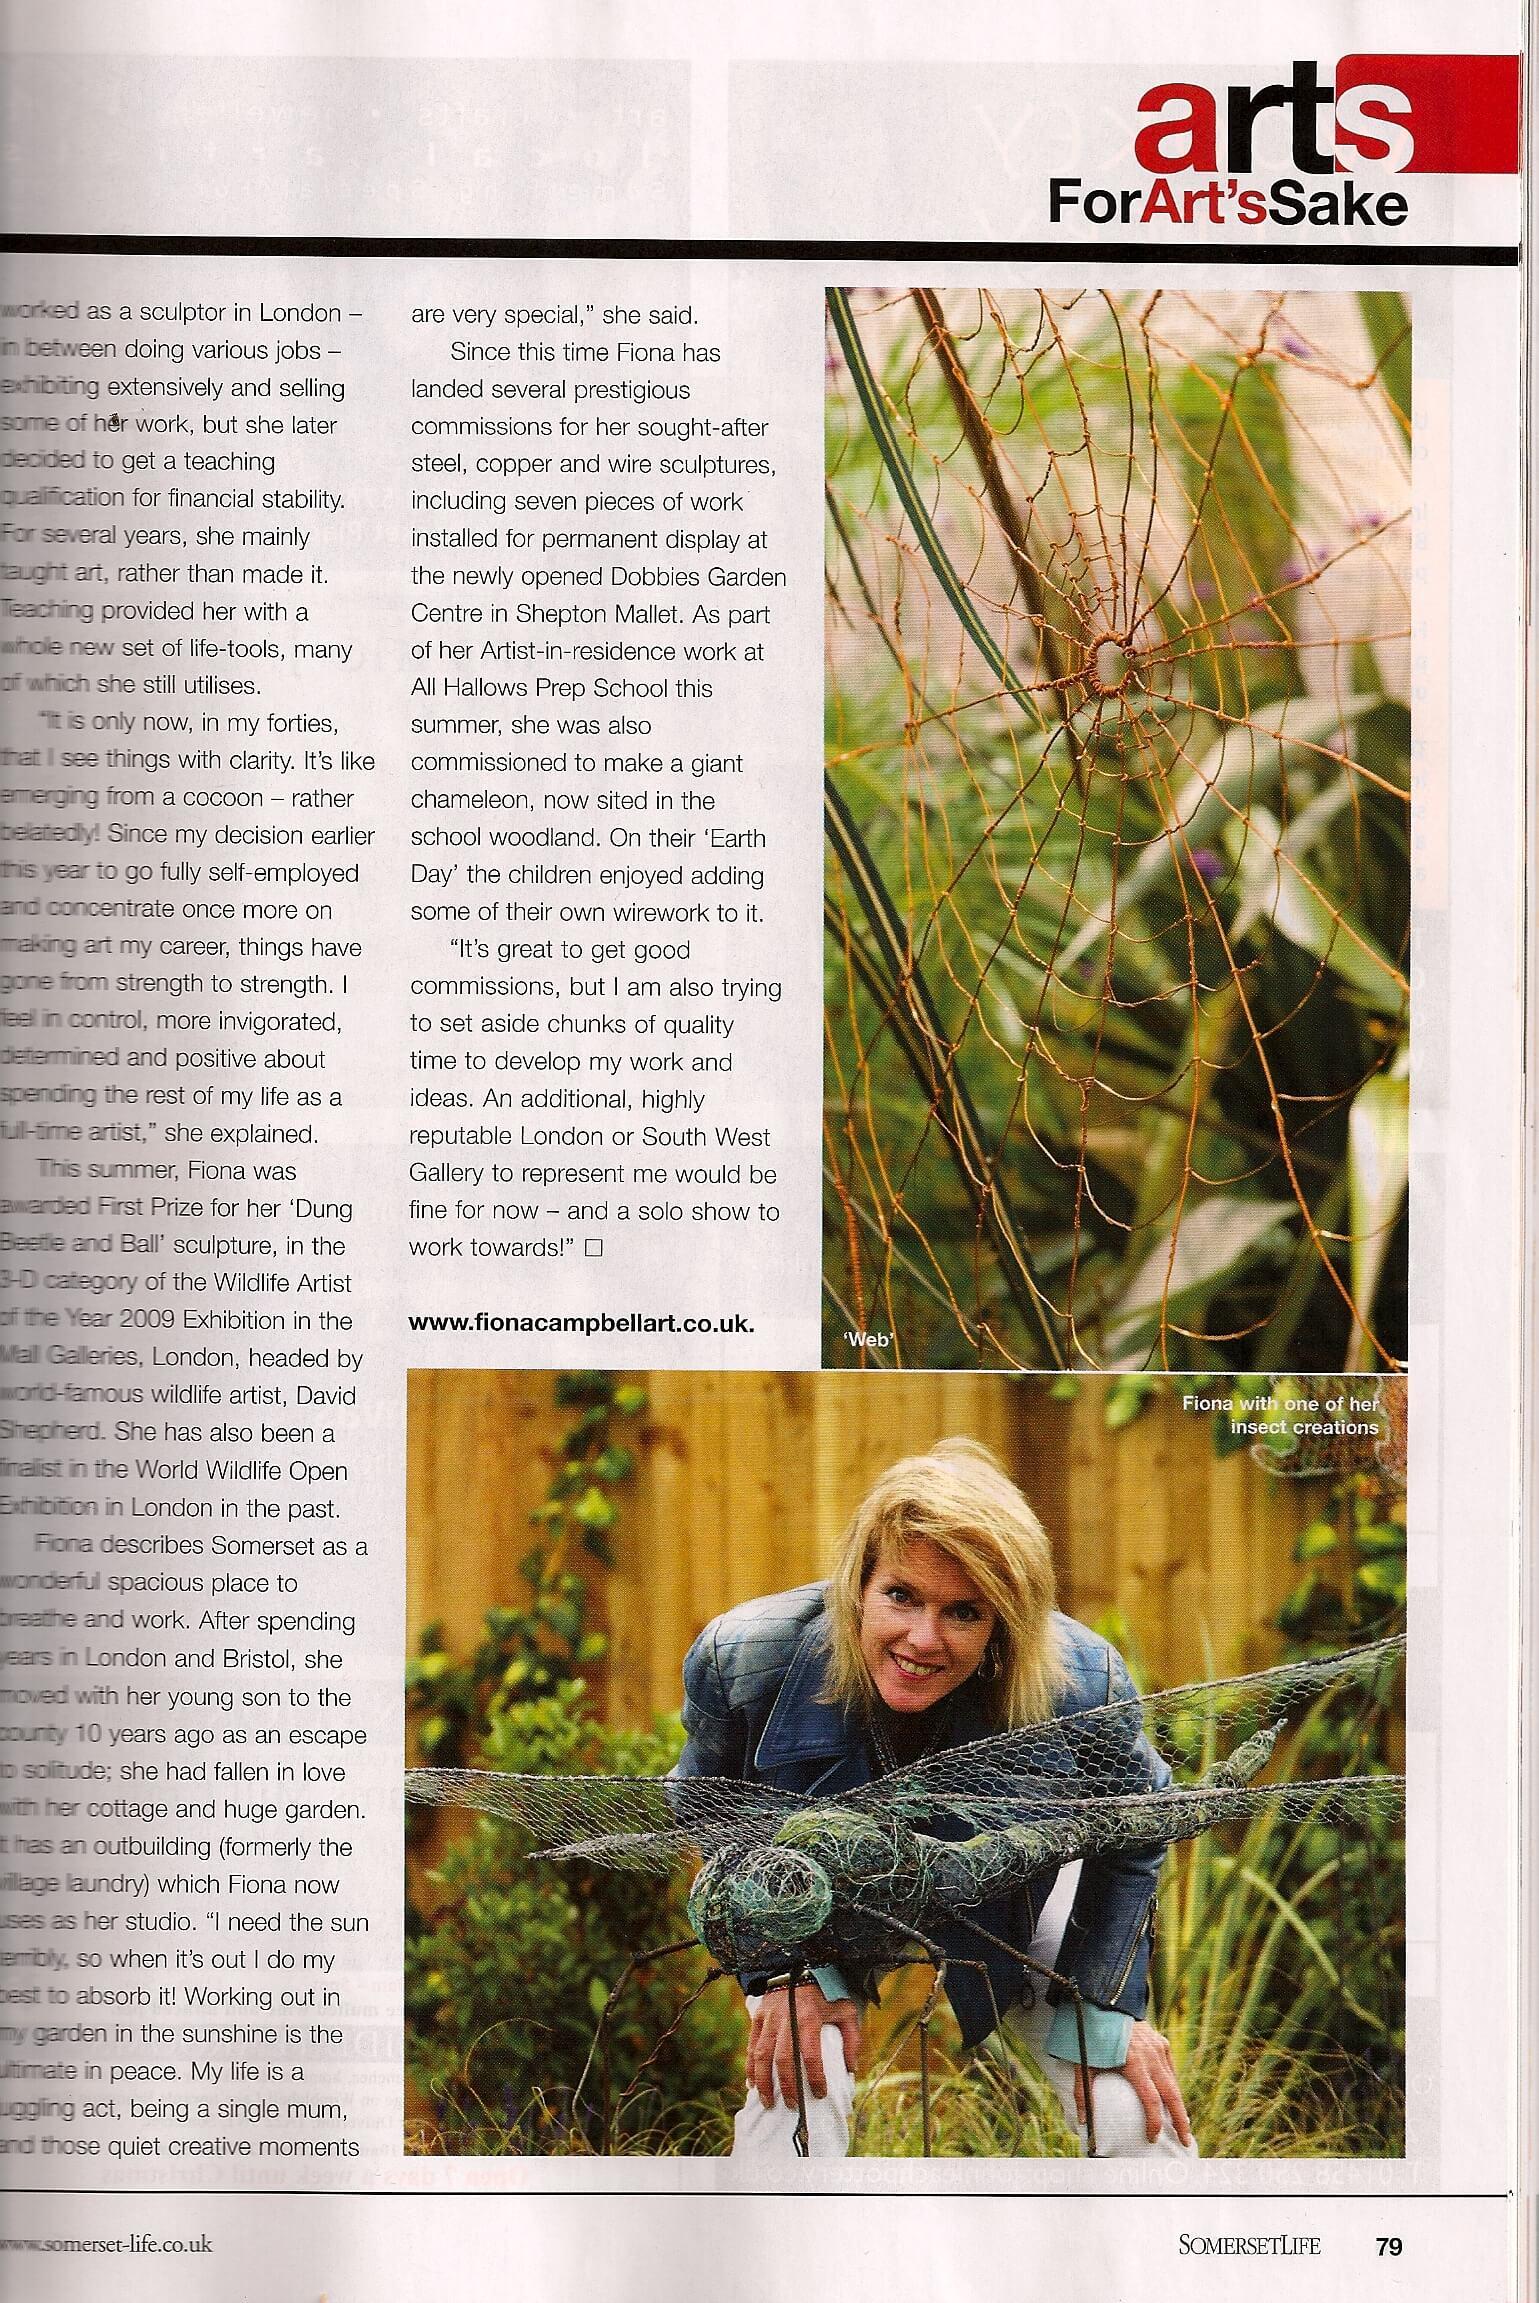 somerset-life-article-p-4-nov-092.jpg